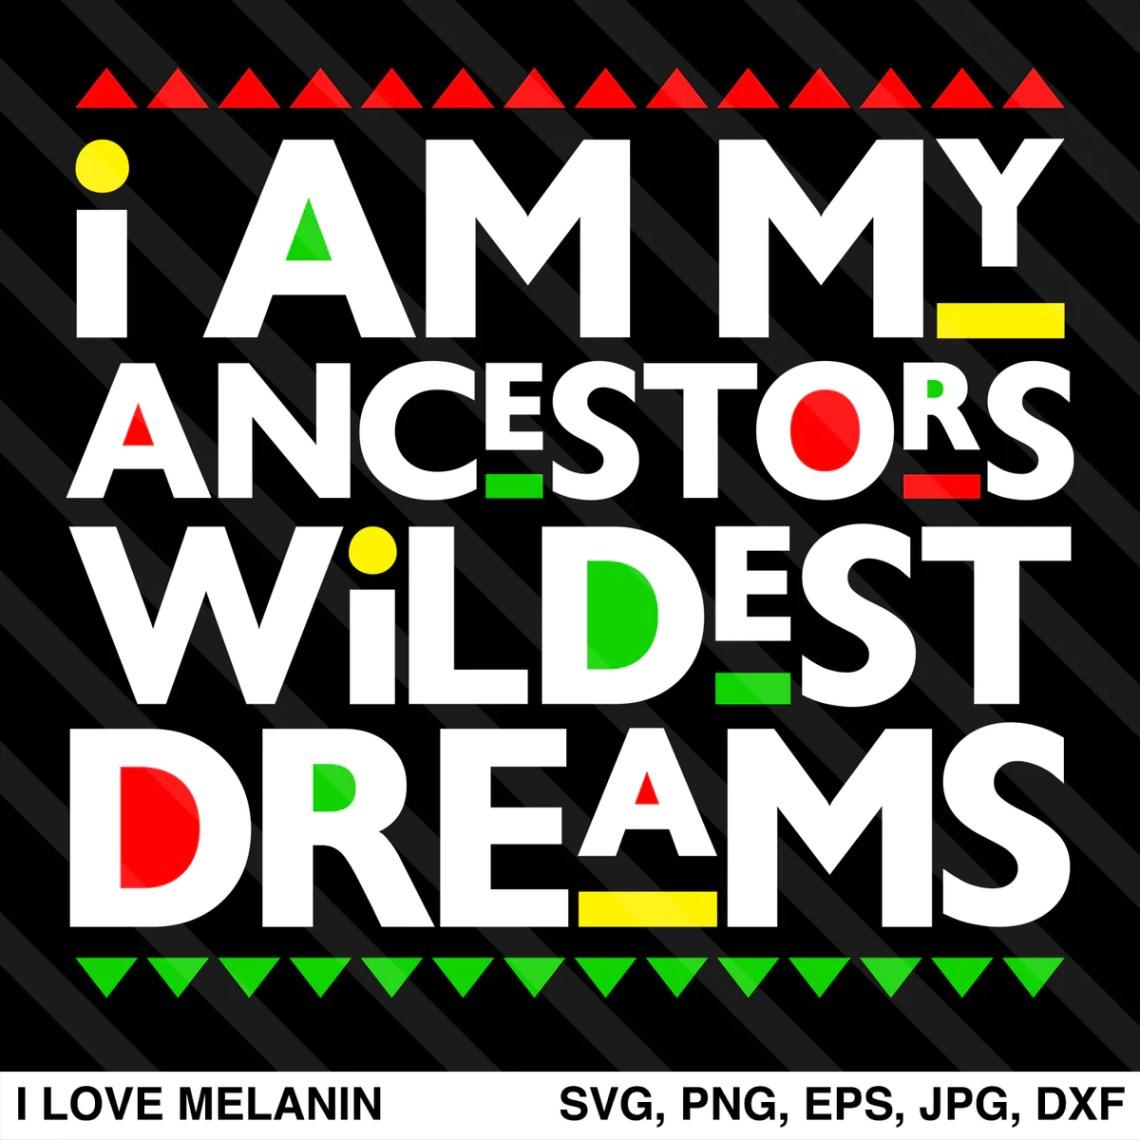 Download I Am My Ancestors Wildest Dreams SVG - I Love Melanin